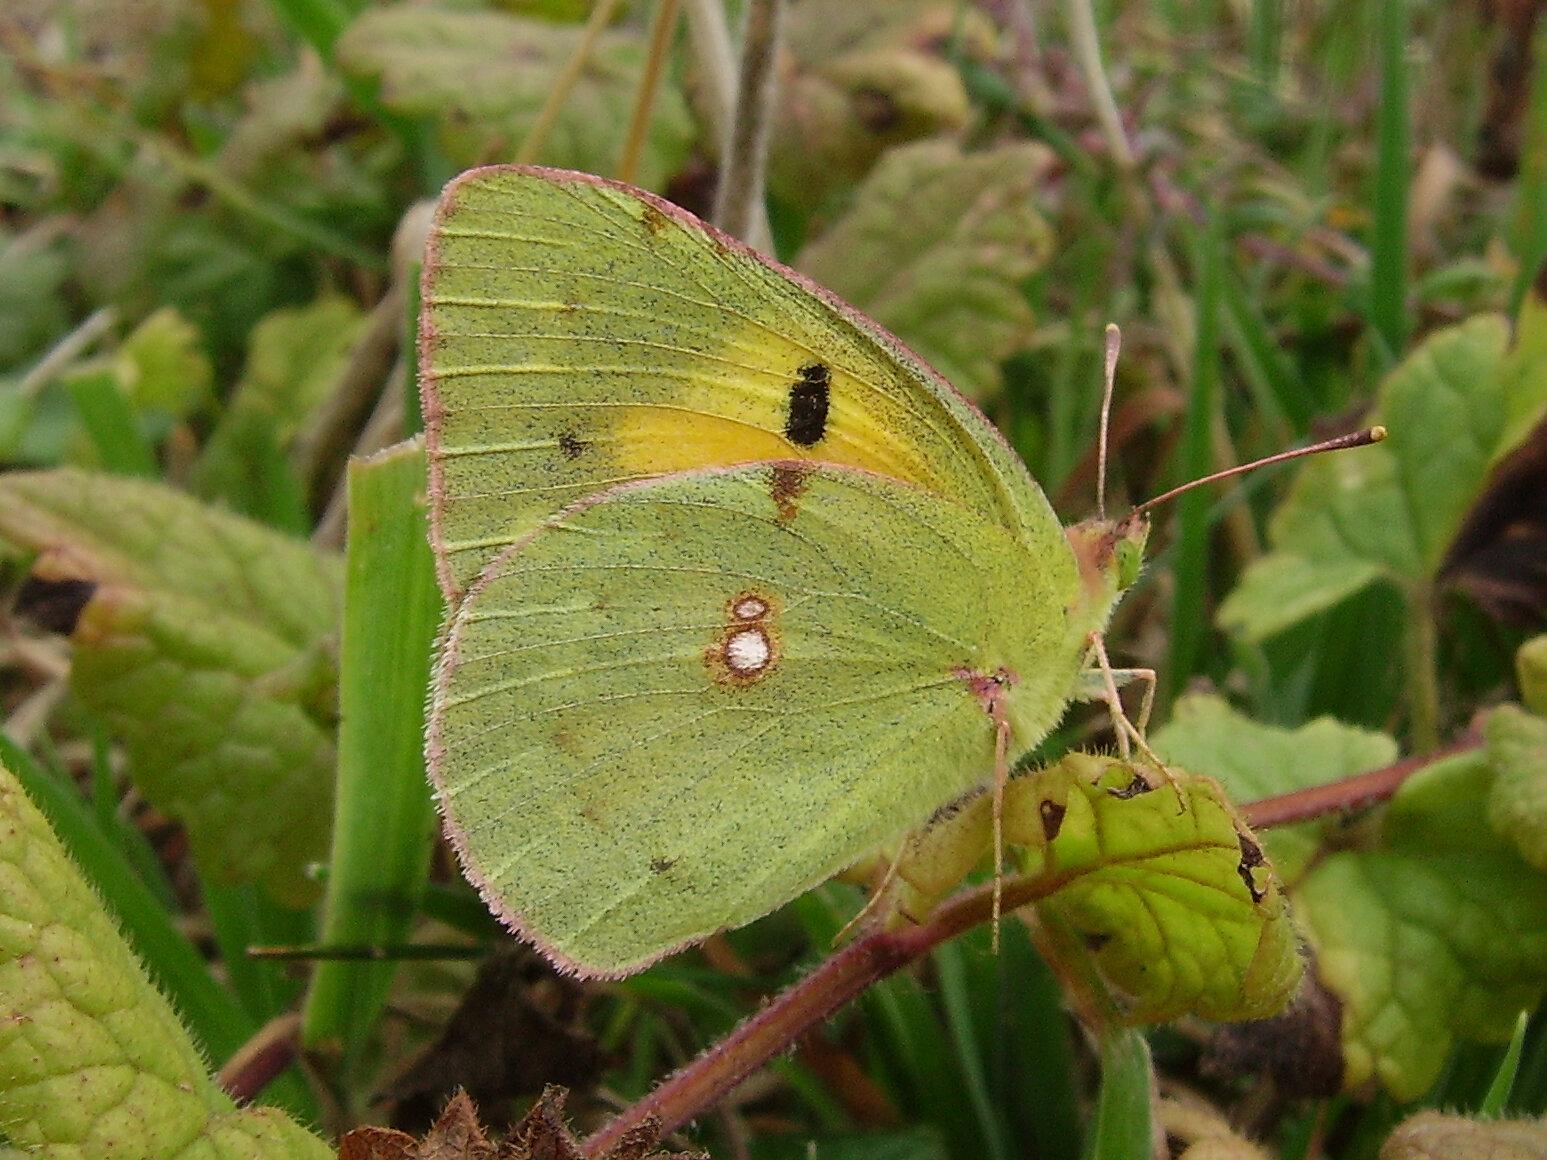 Clouded yellow underside butterfly, Tortington